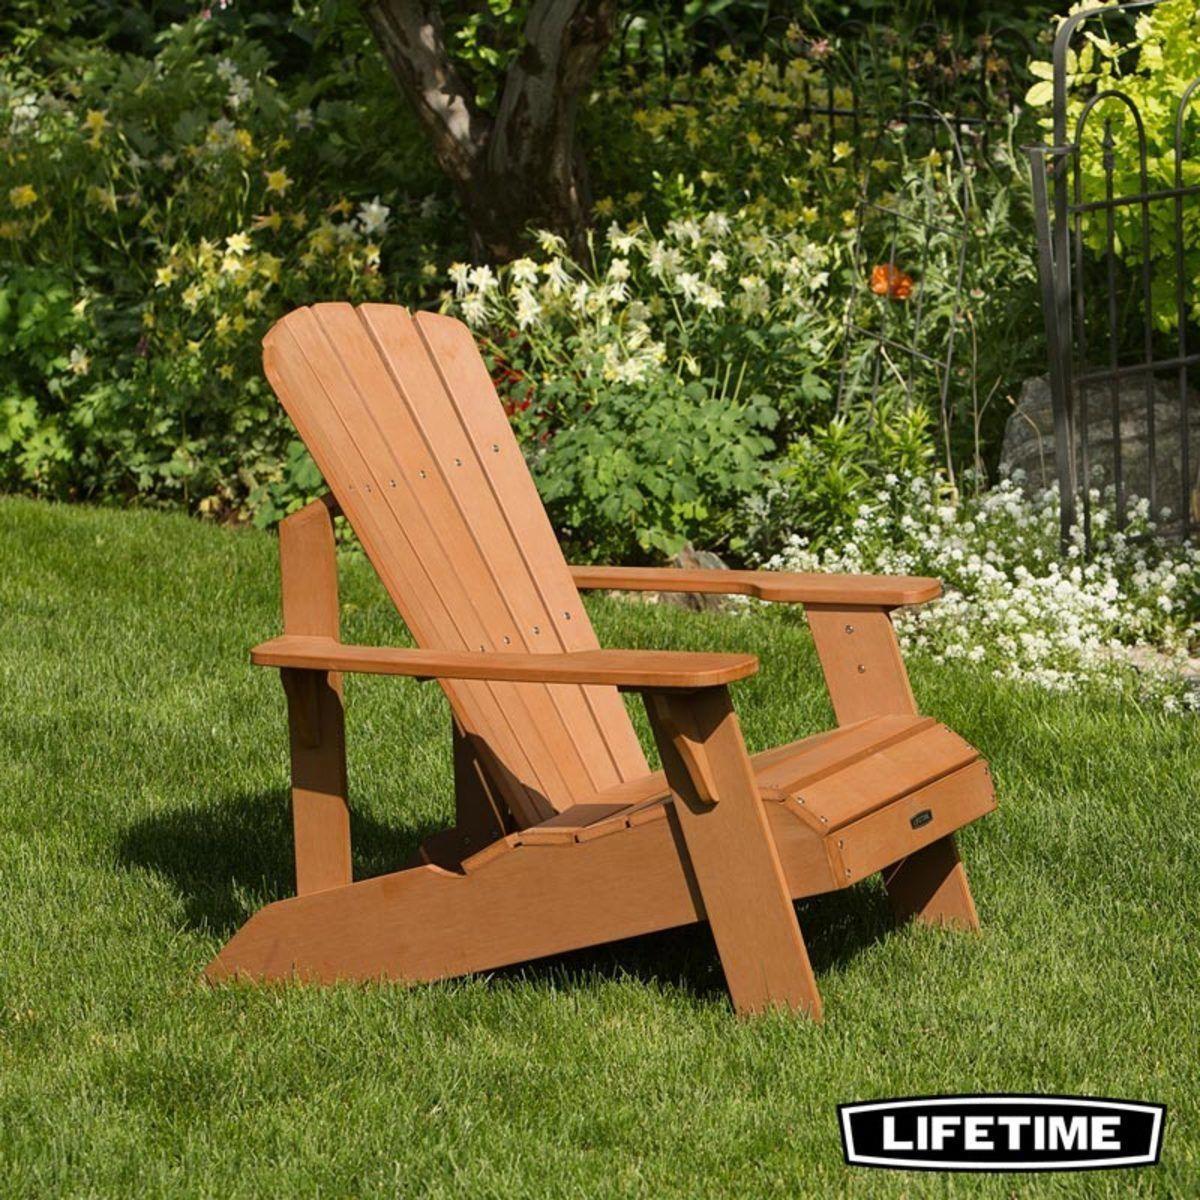 Lifetime adirondack chair costco uk plasticpatiochairs